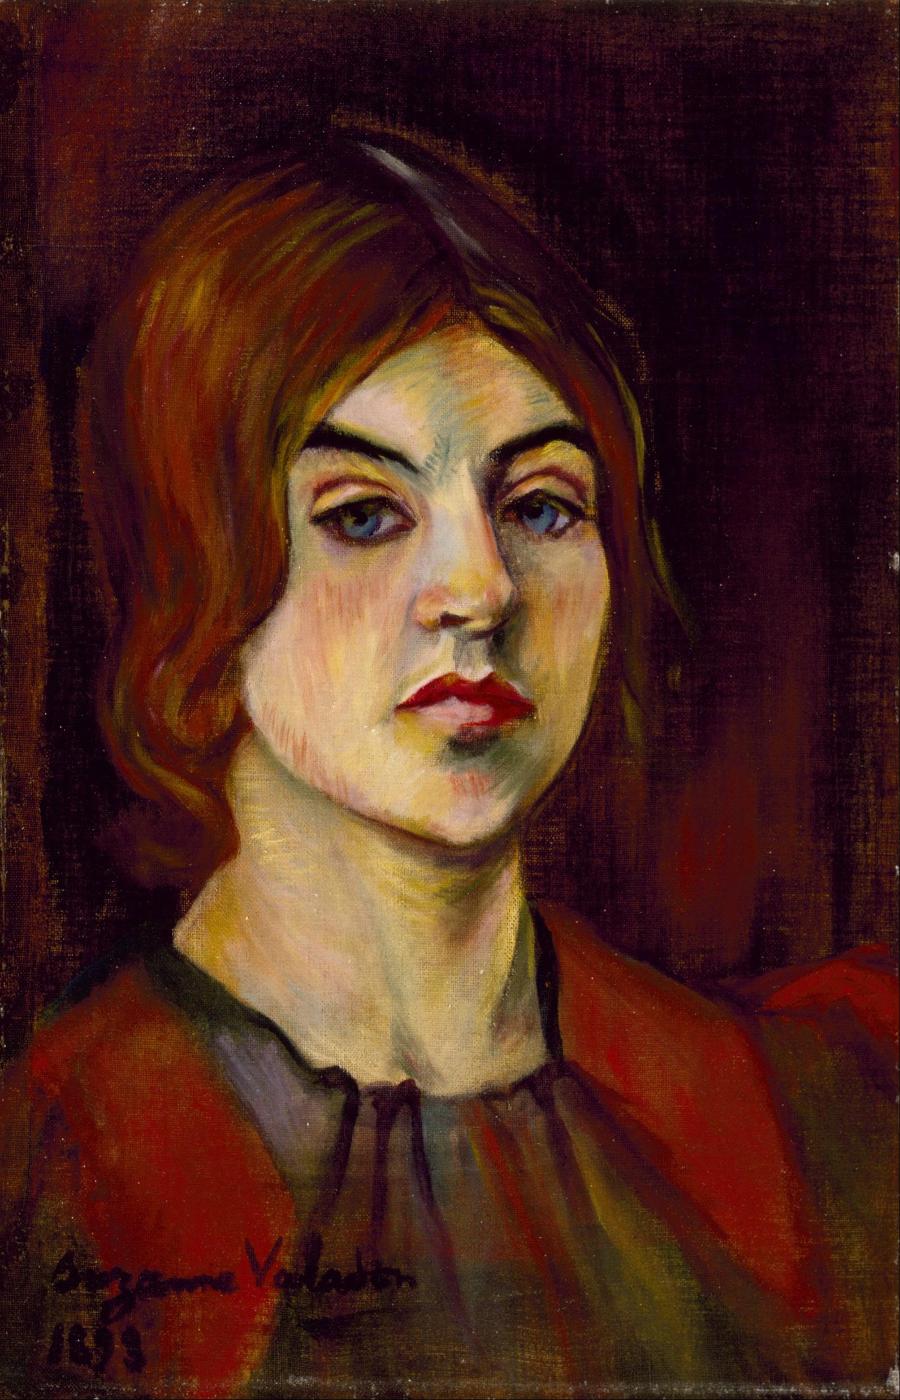 Suzanne Valadon. Autorretrato 1898